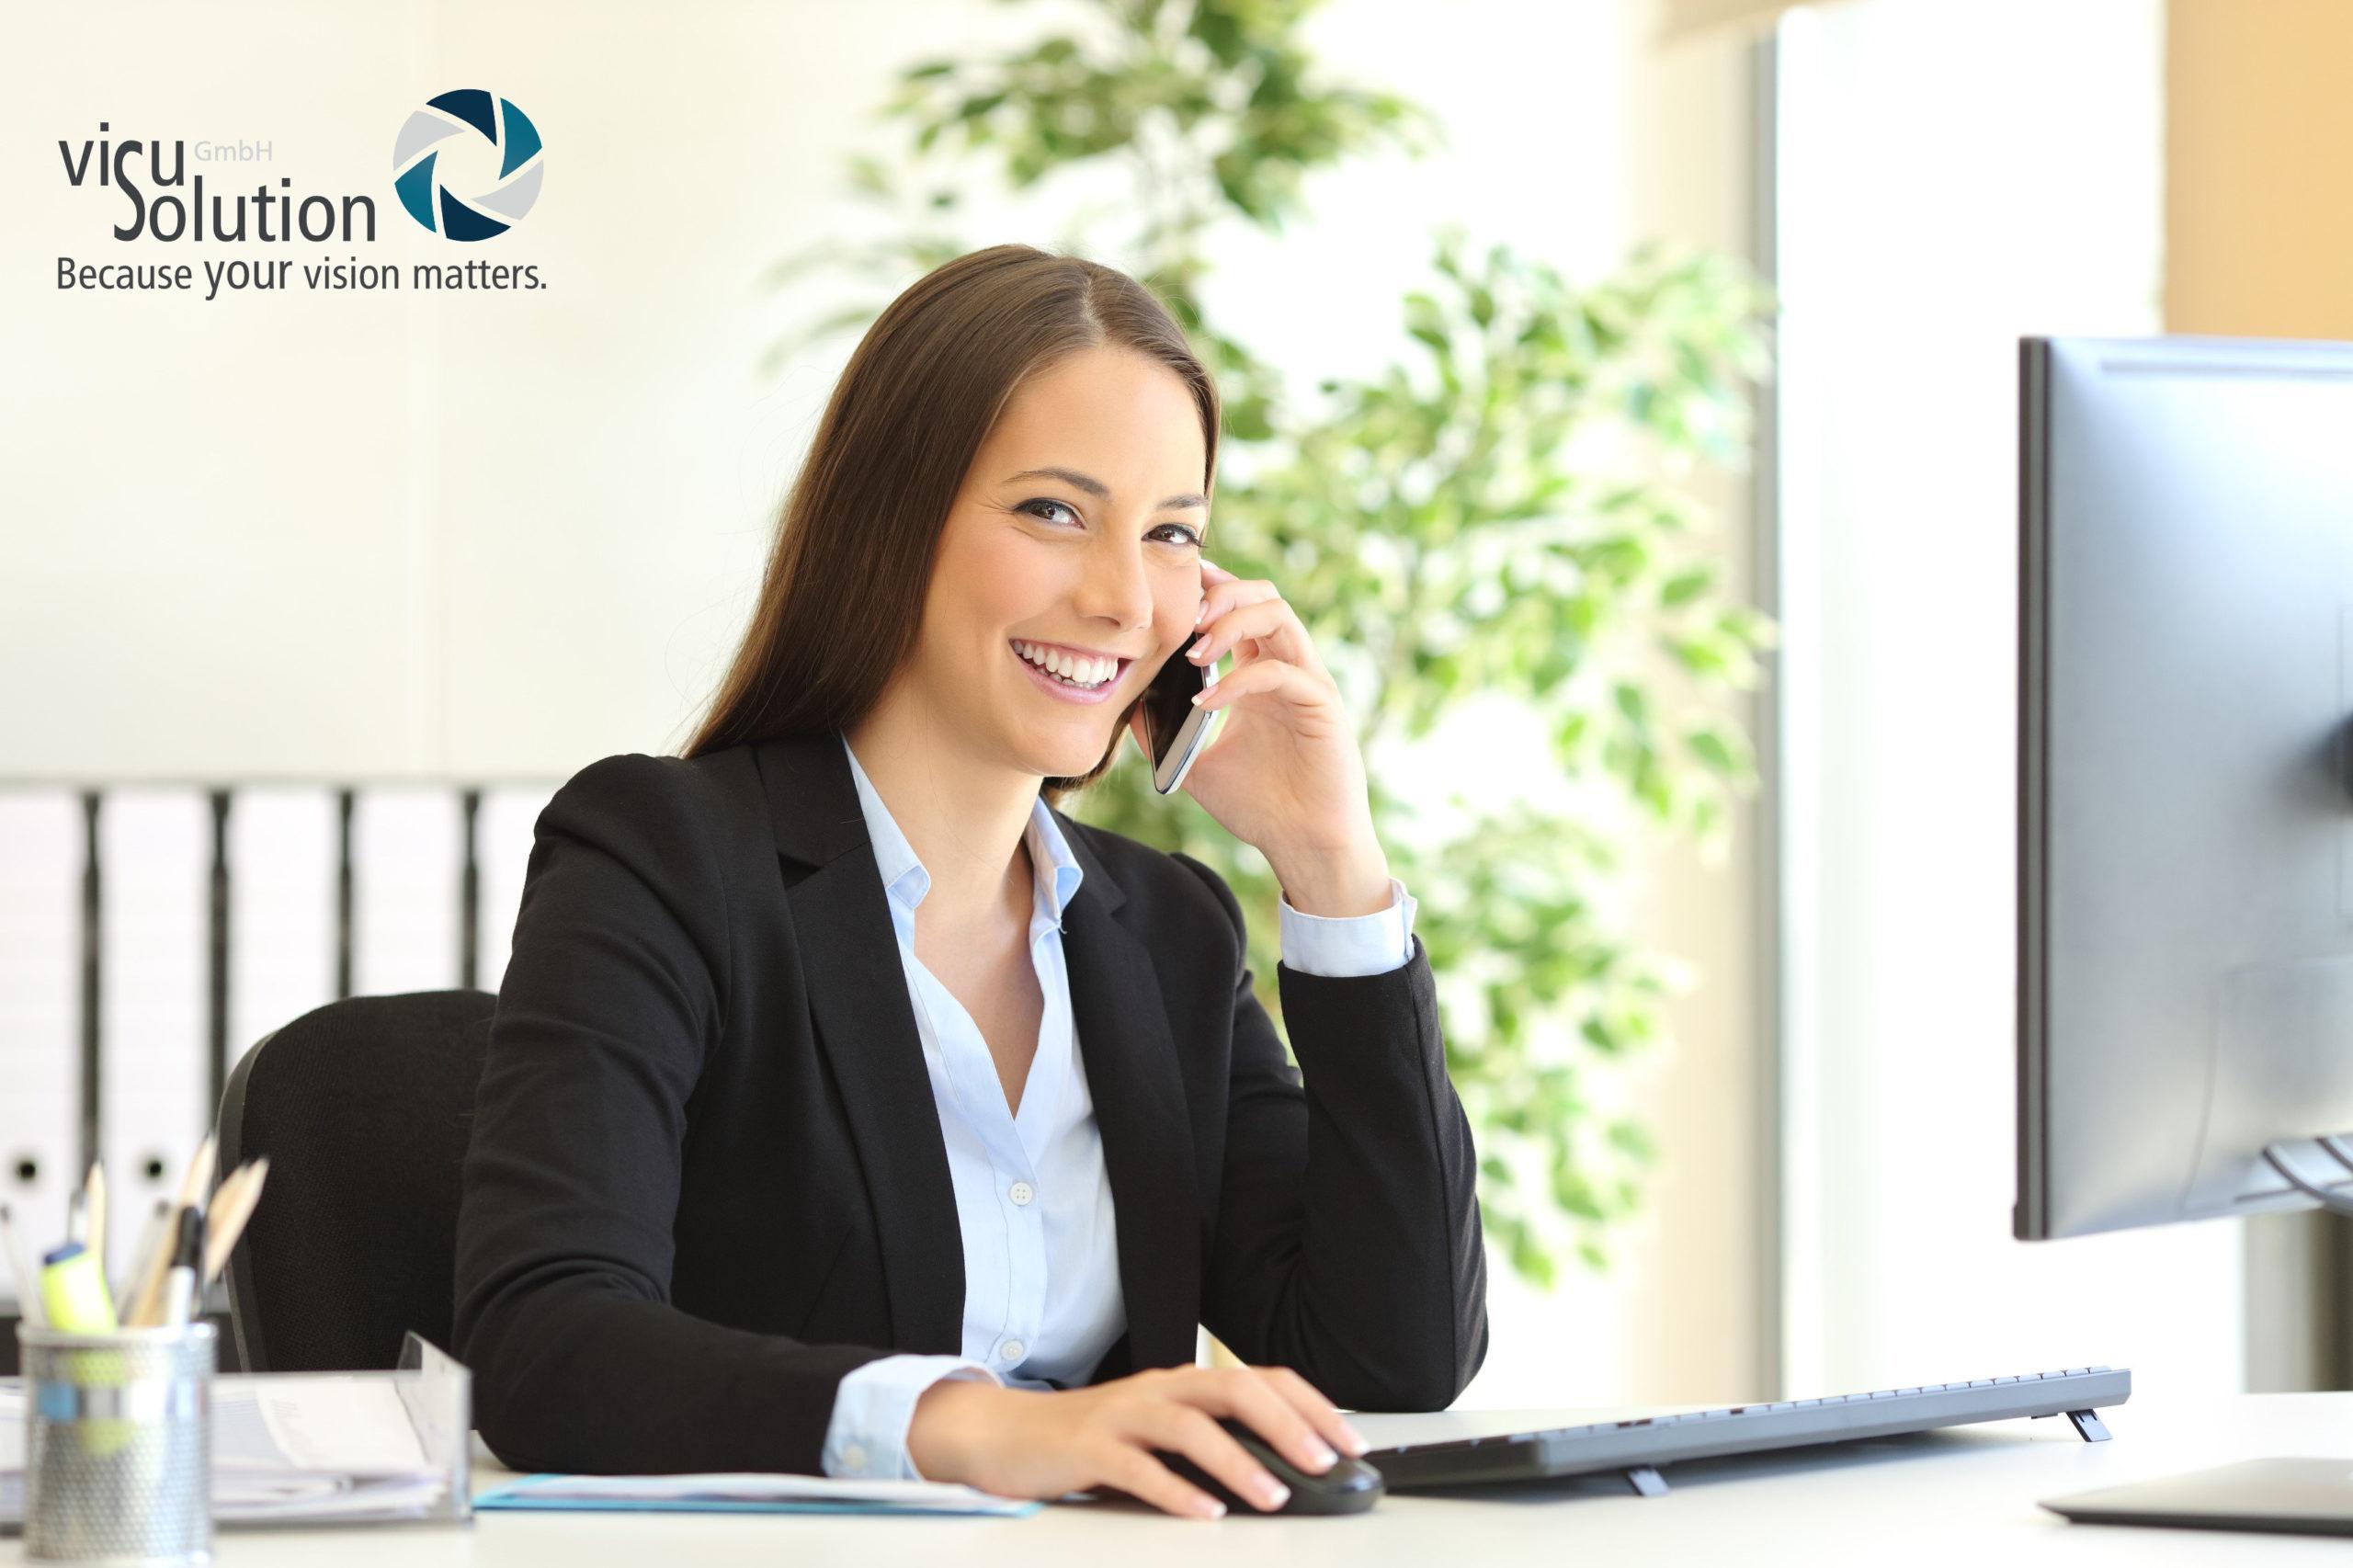 Technischer Kundenbetreuer/ Servicetechniker (m/w/d)